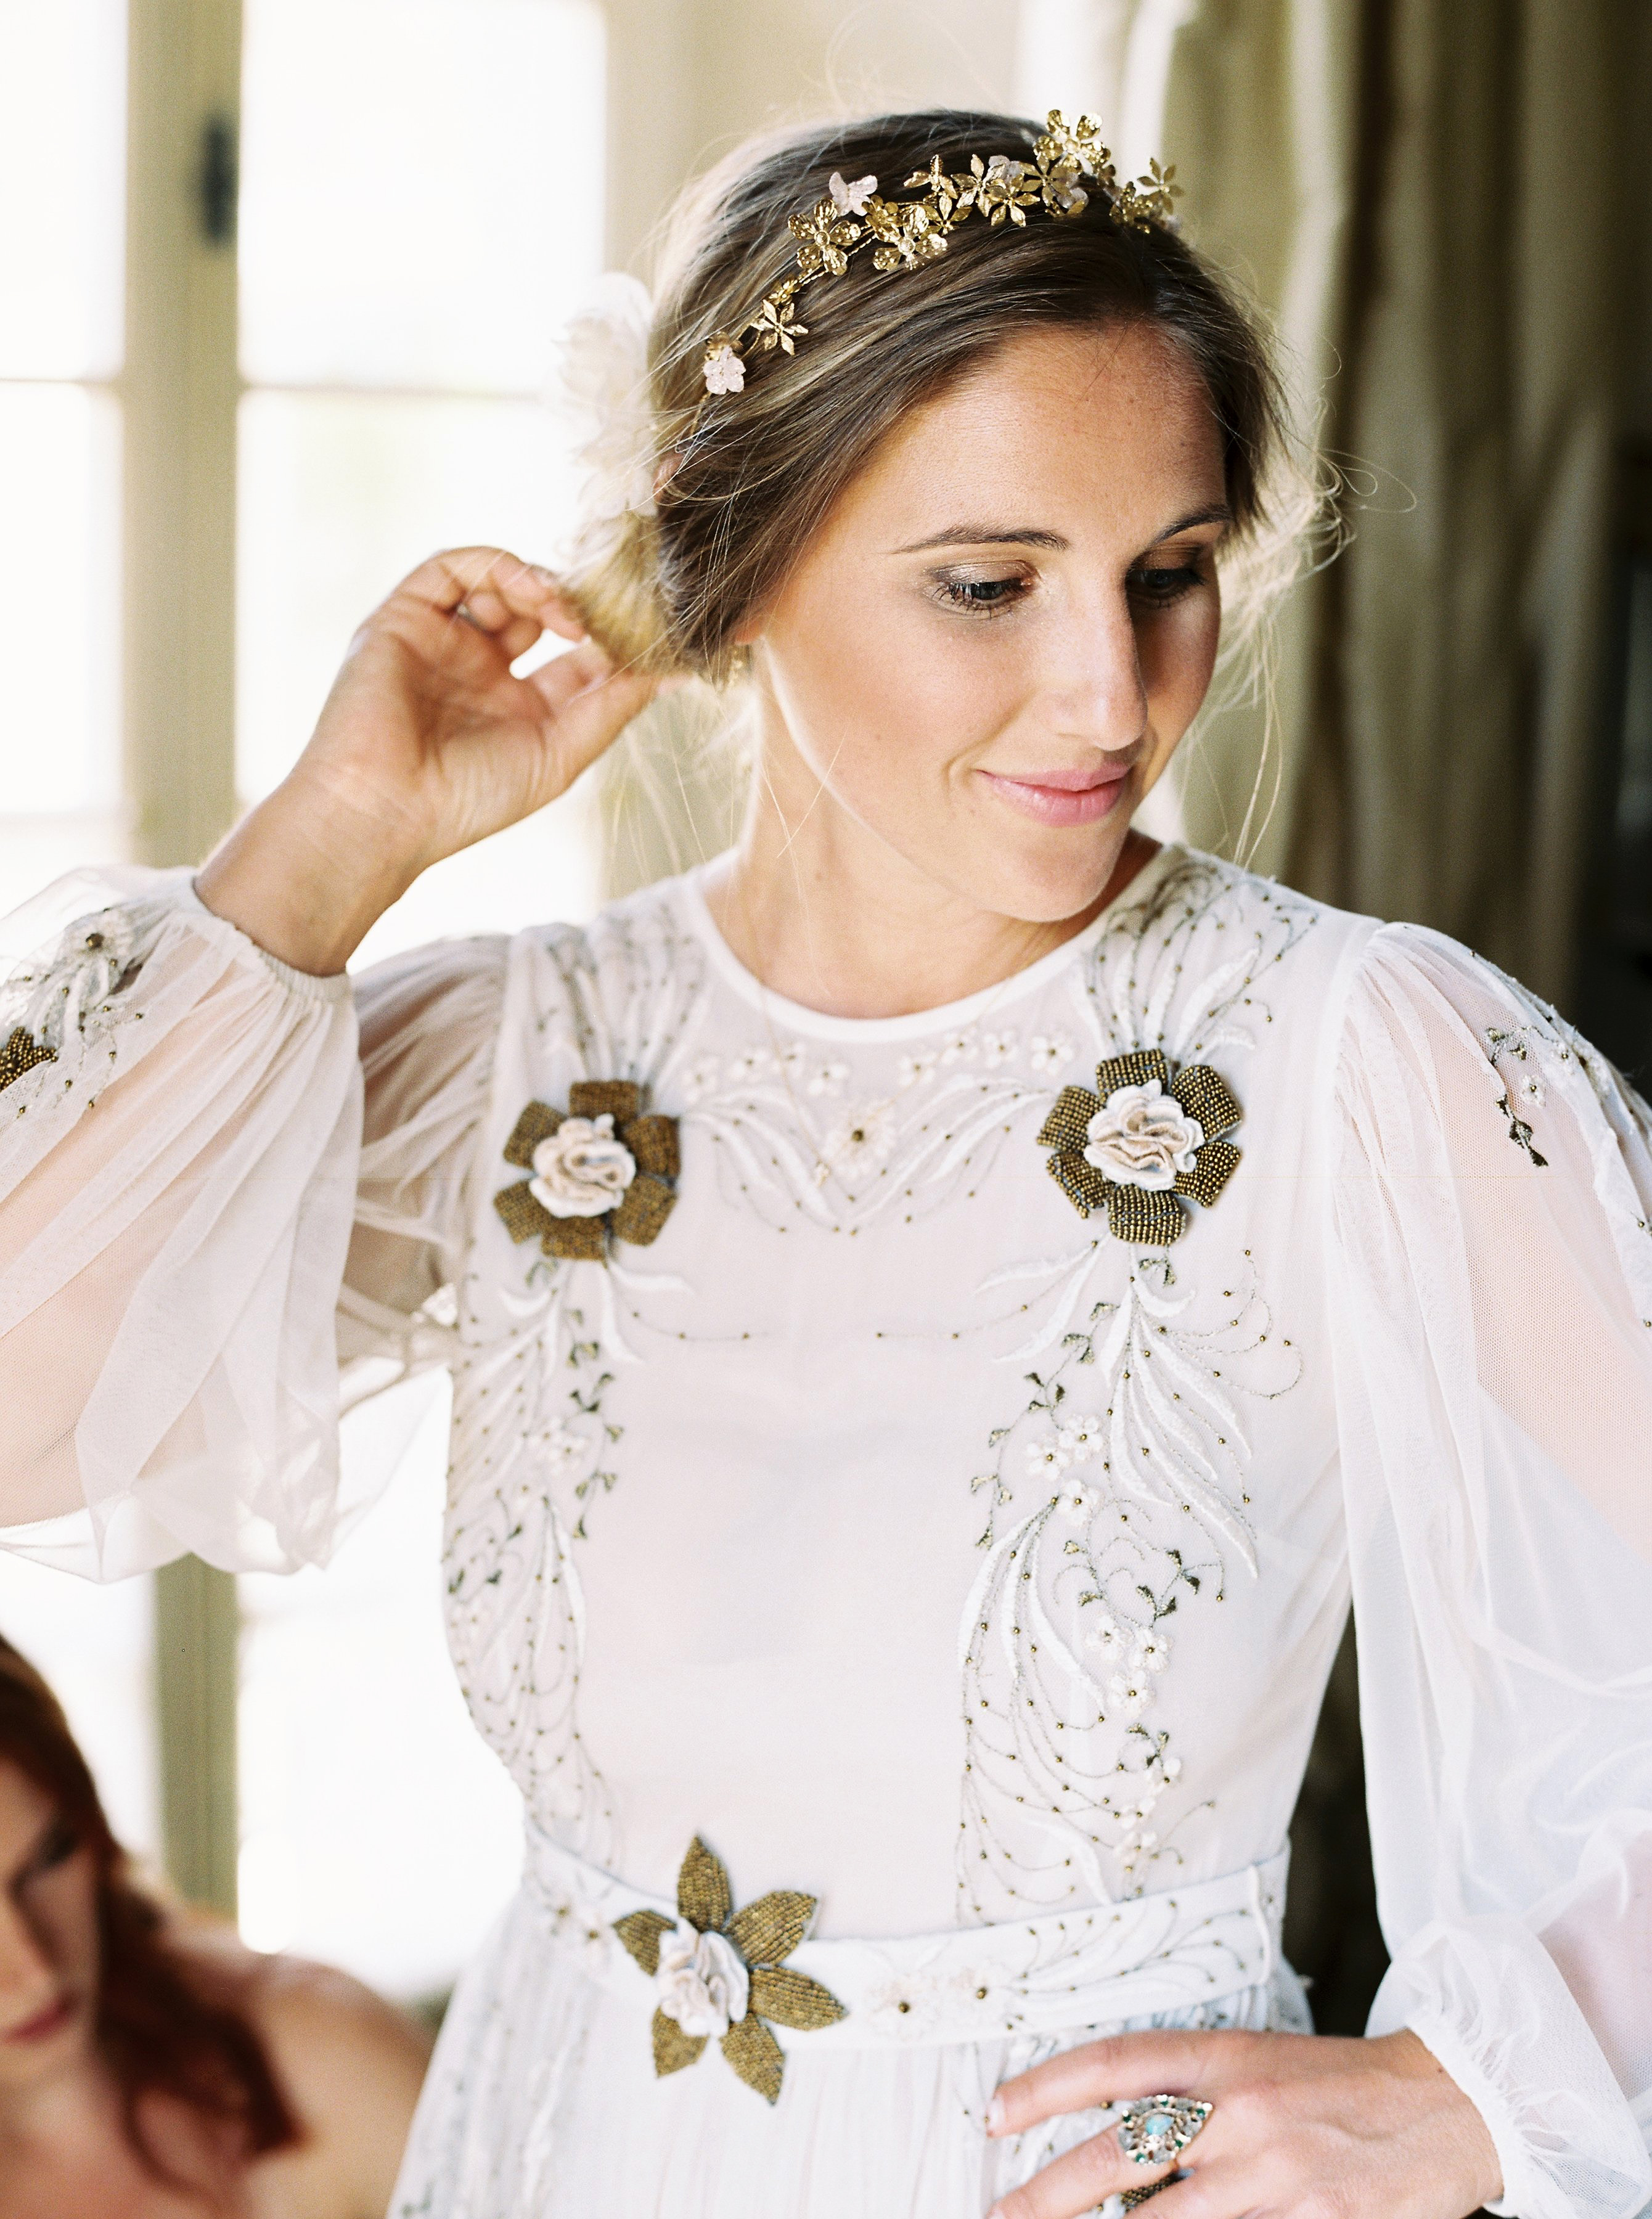 alexis zach wedding italy bride dress headband